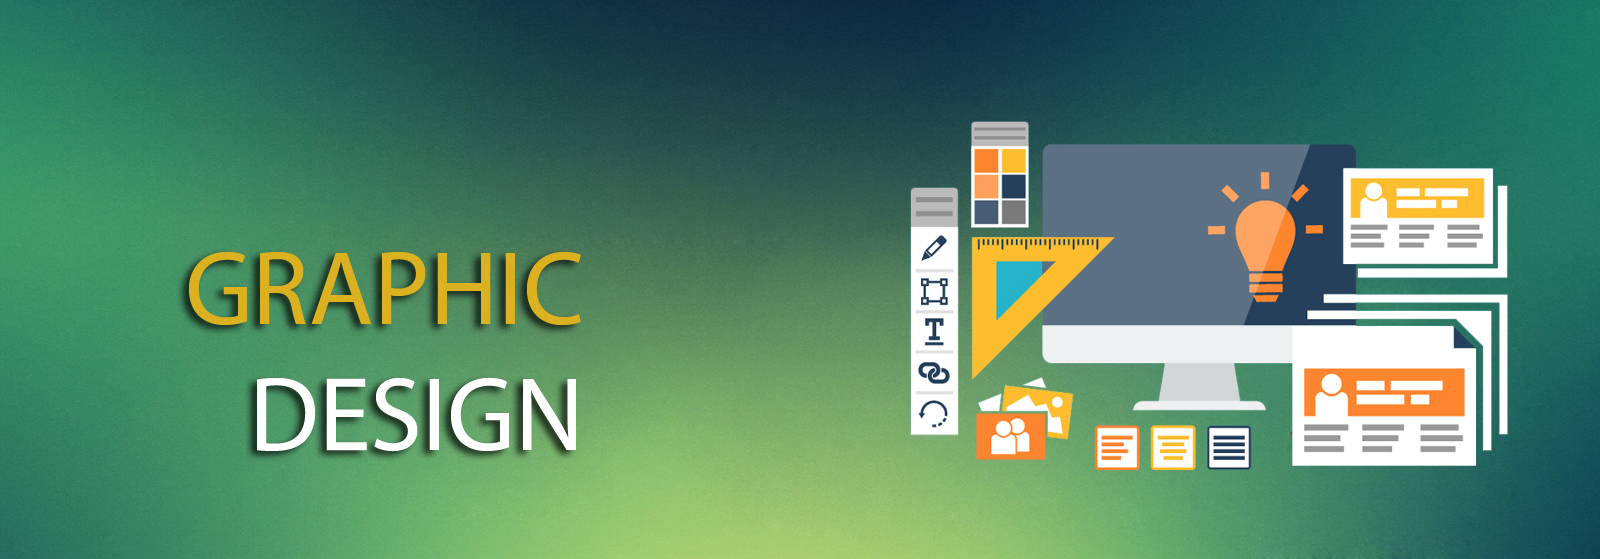 seo friendly website design guidelines